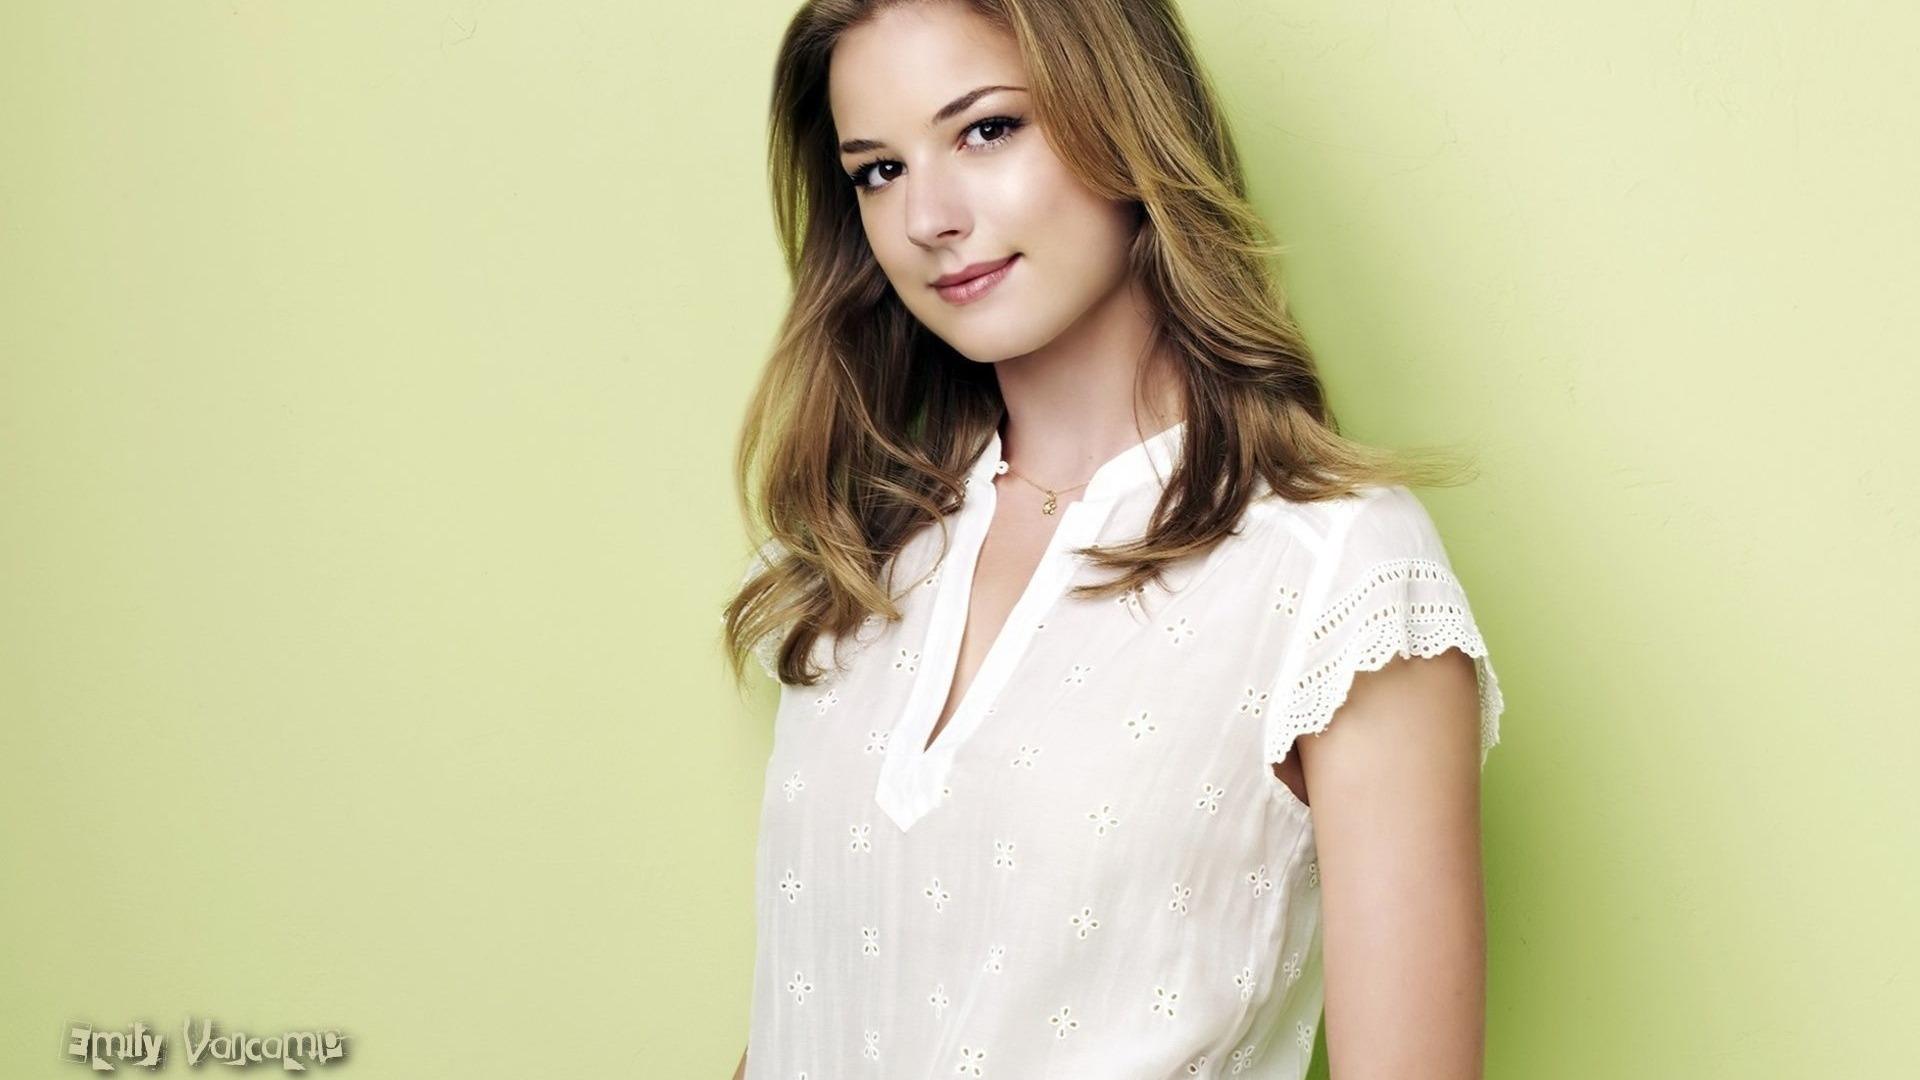 Emily VanCamp Wallpa